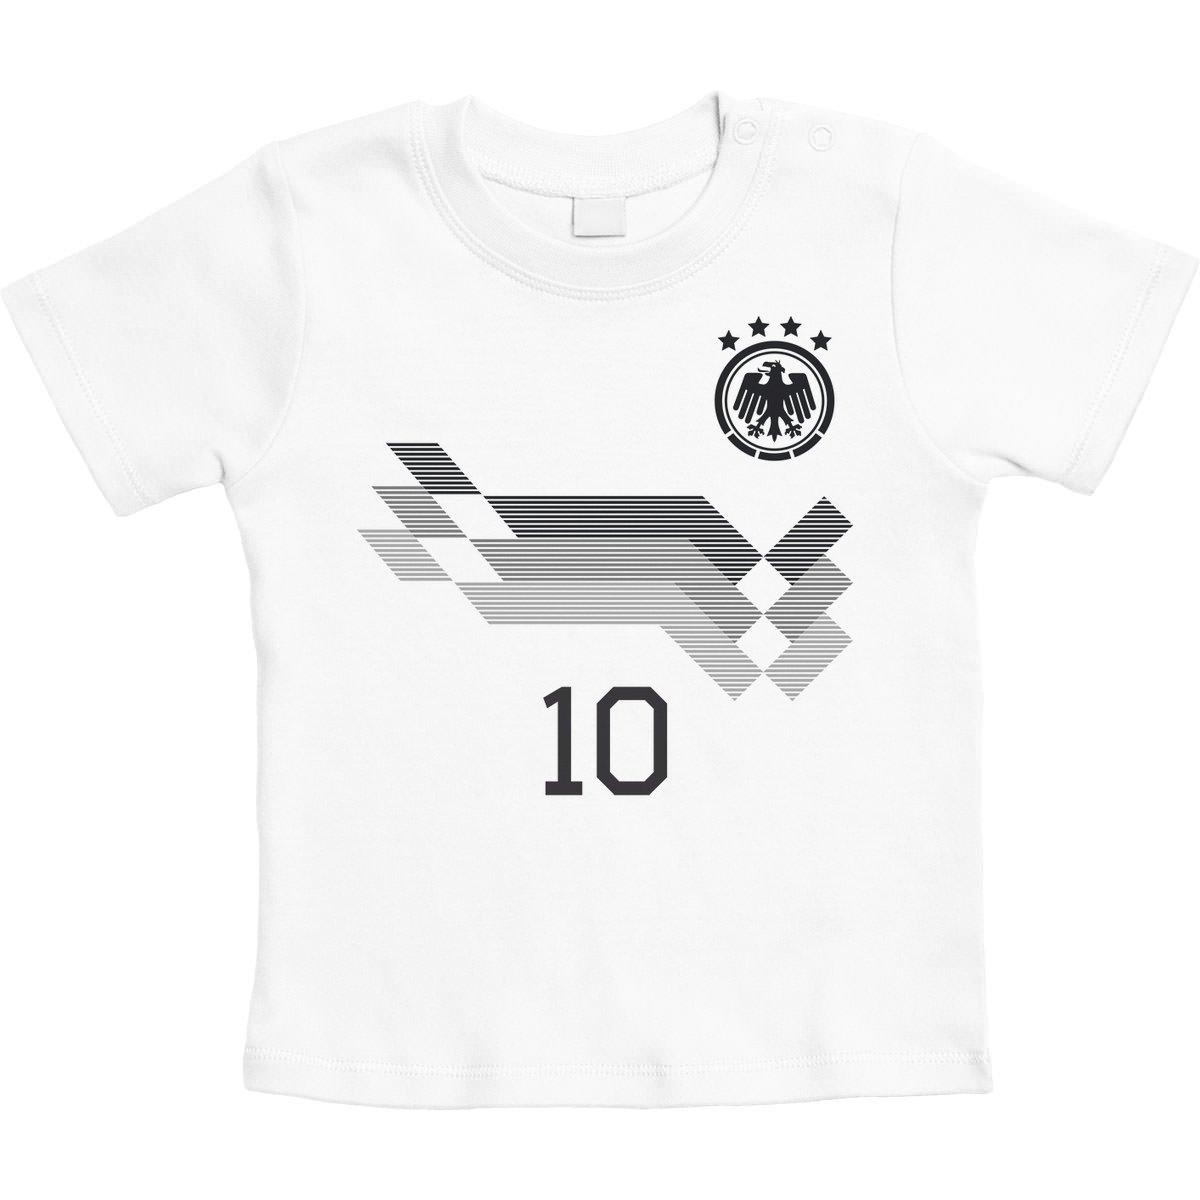 NR rot Druck NAME Dänemark Kinder BABY BODY Größe WM 2018 T-Shirt Trikot